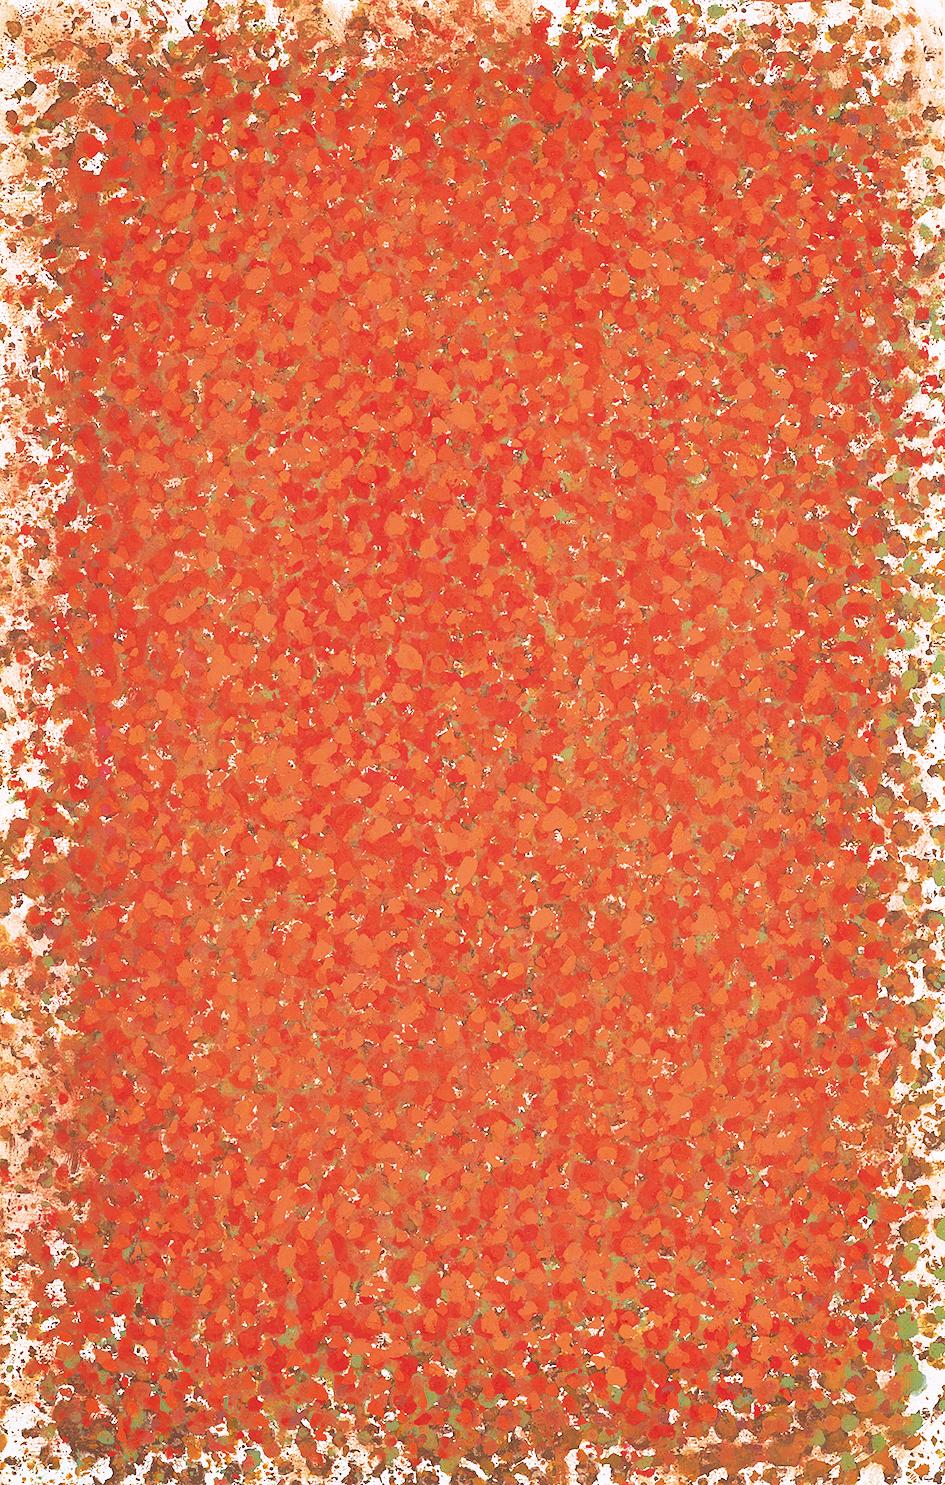 Gonschior Kuno, Untitled